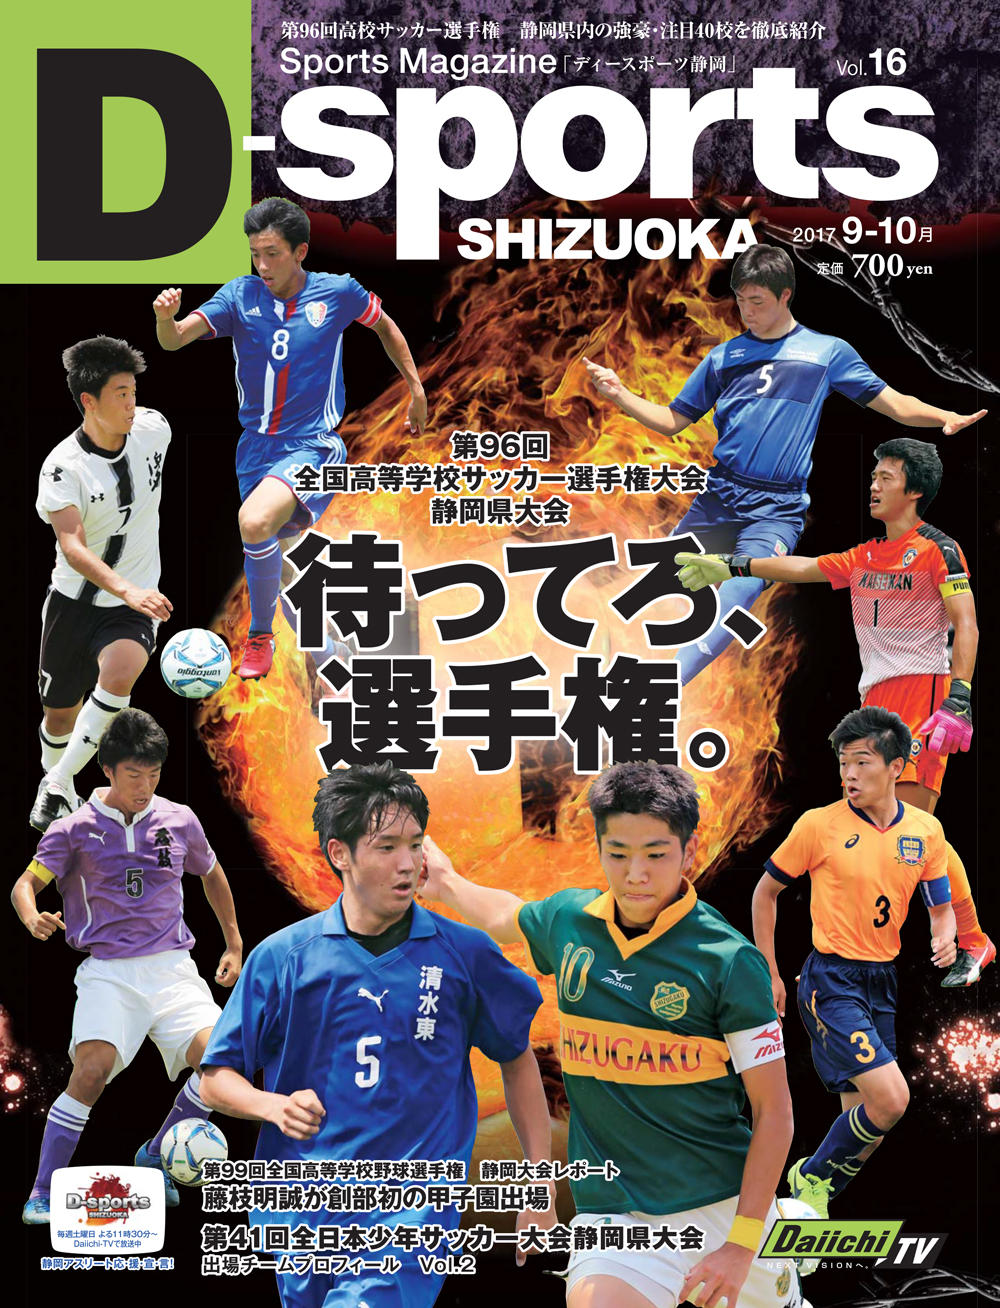 http://d-sports.shizuokastandard.jp/article/2017/16_h1.jpg